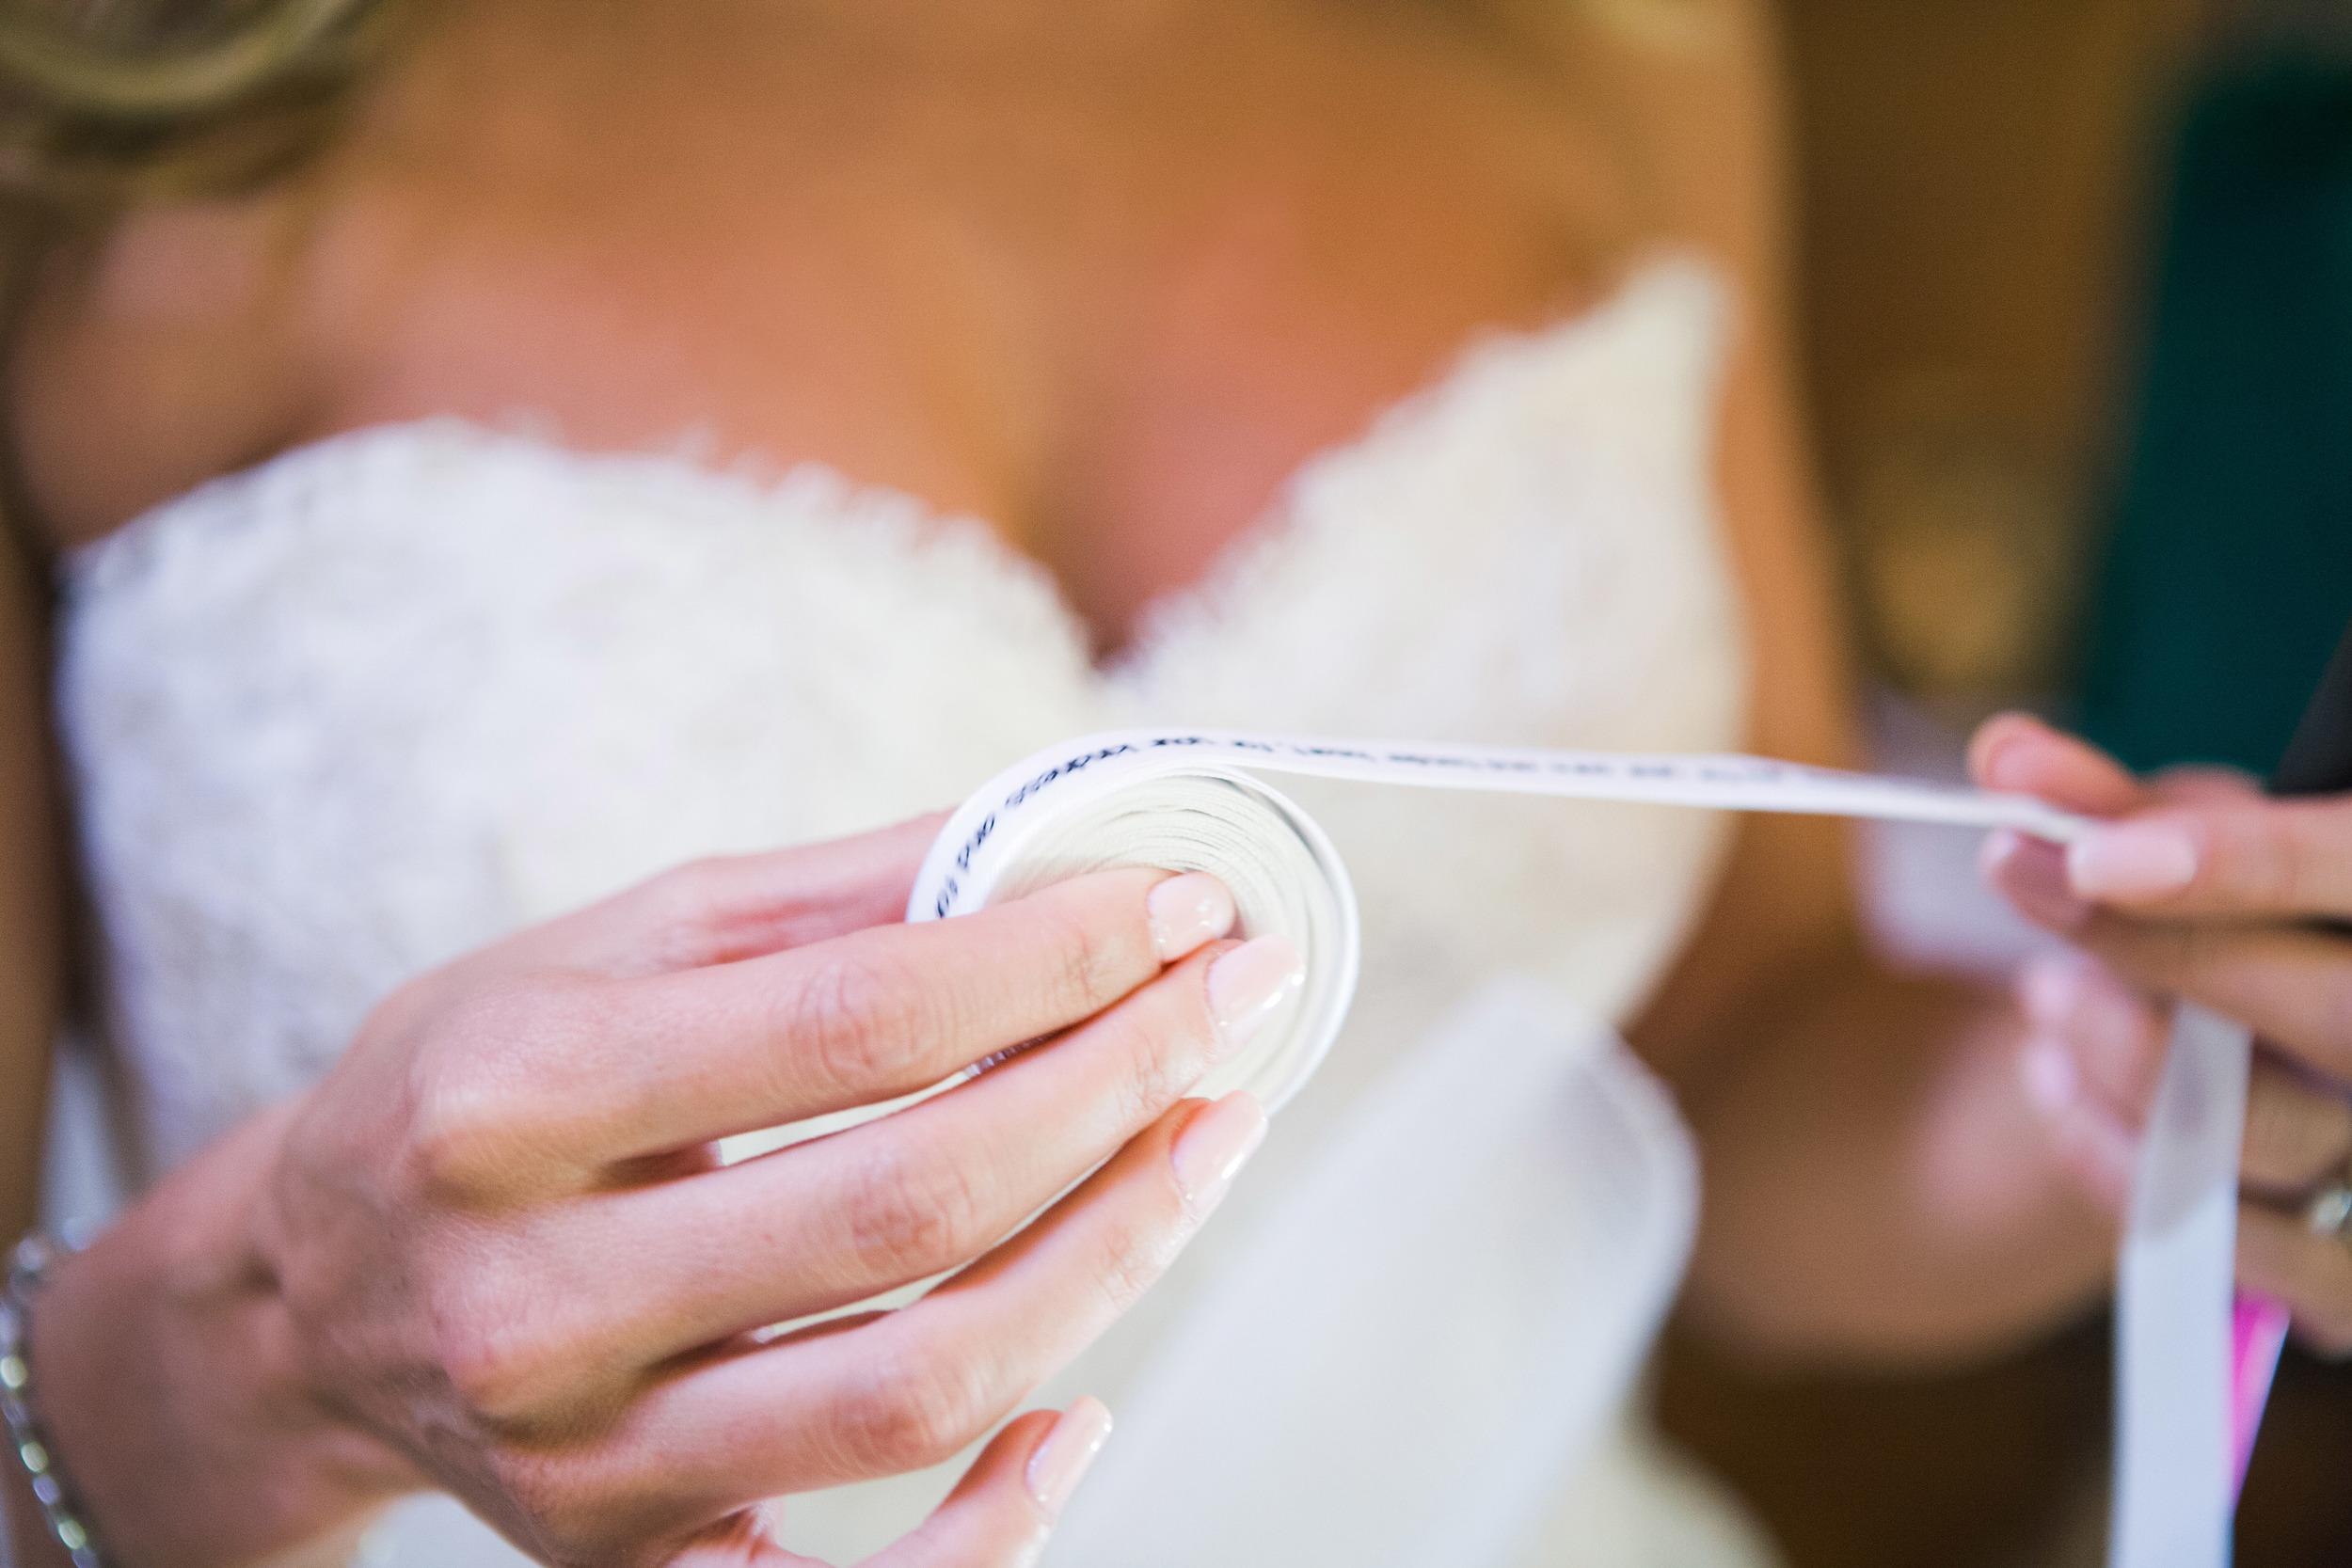 07. Brides Vows, Vows on ribbon, personalized vows, napa wedding, vineyard wedding.jpg